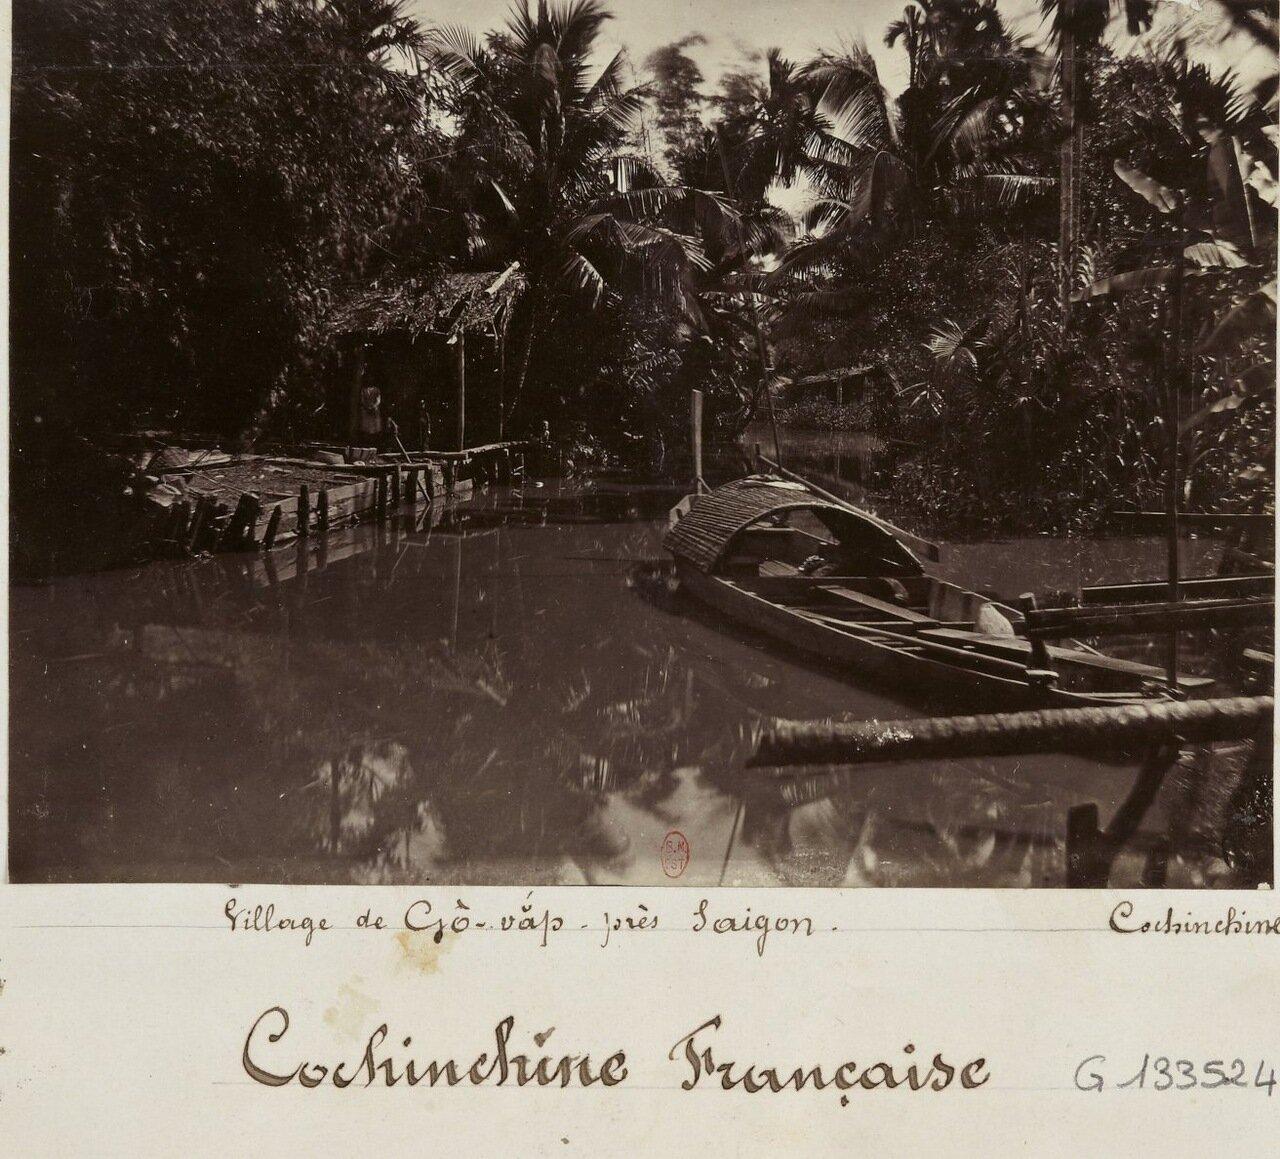 Французская Кохинхина. Деревня на реке Сайгон